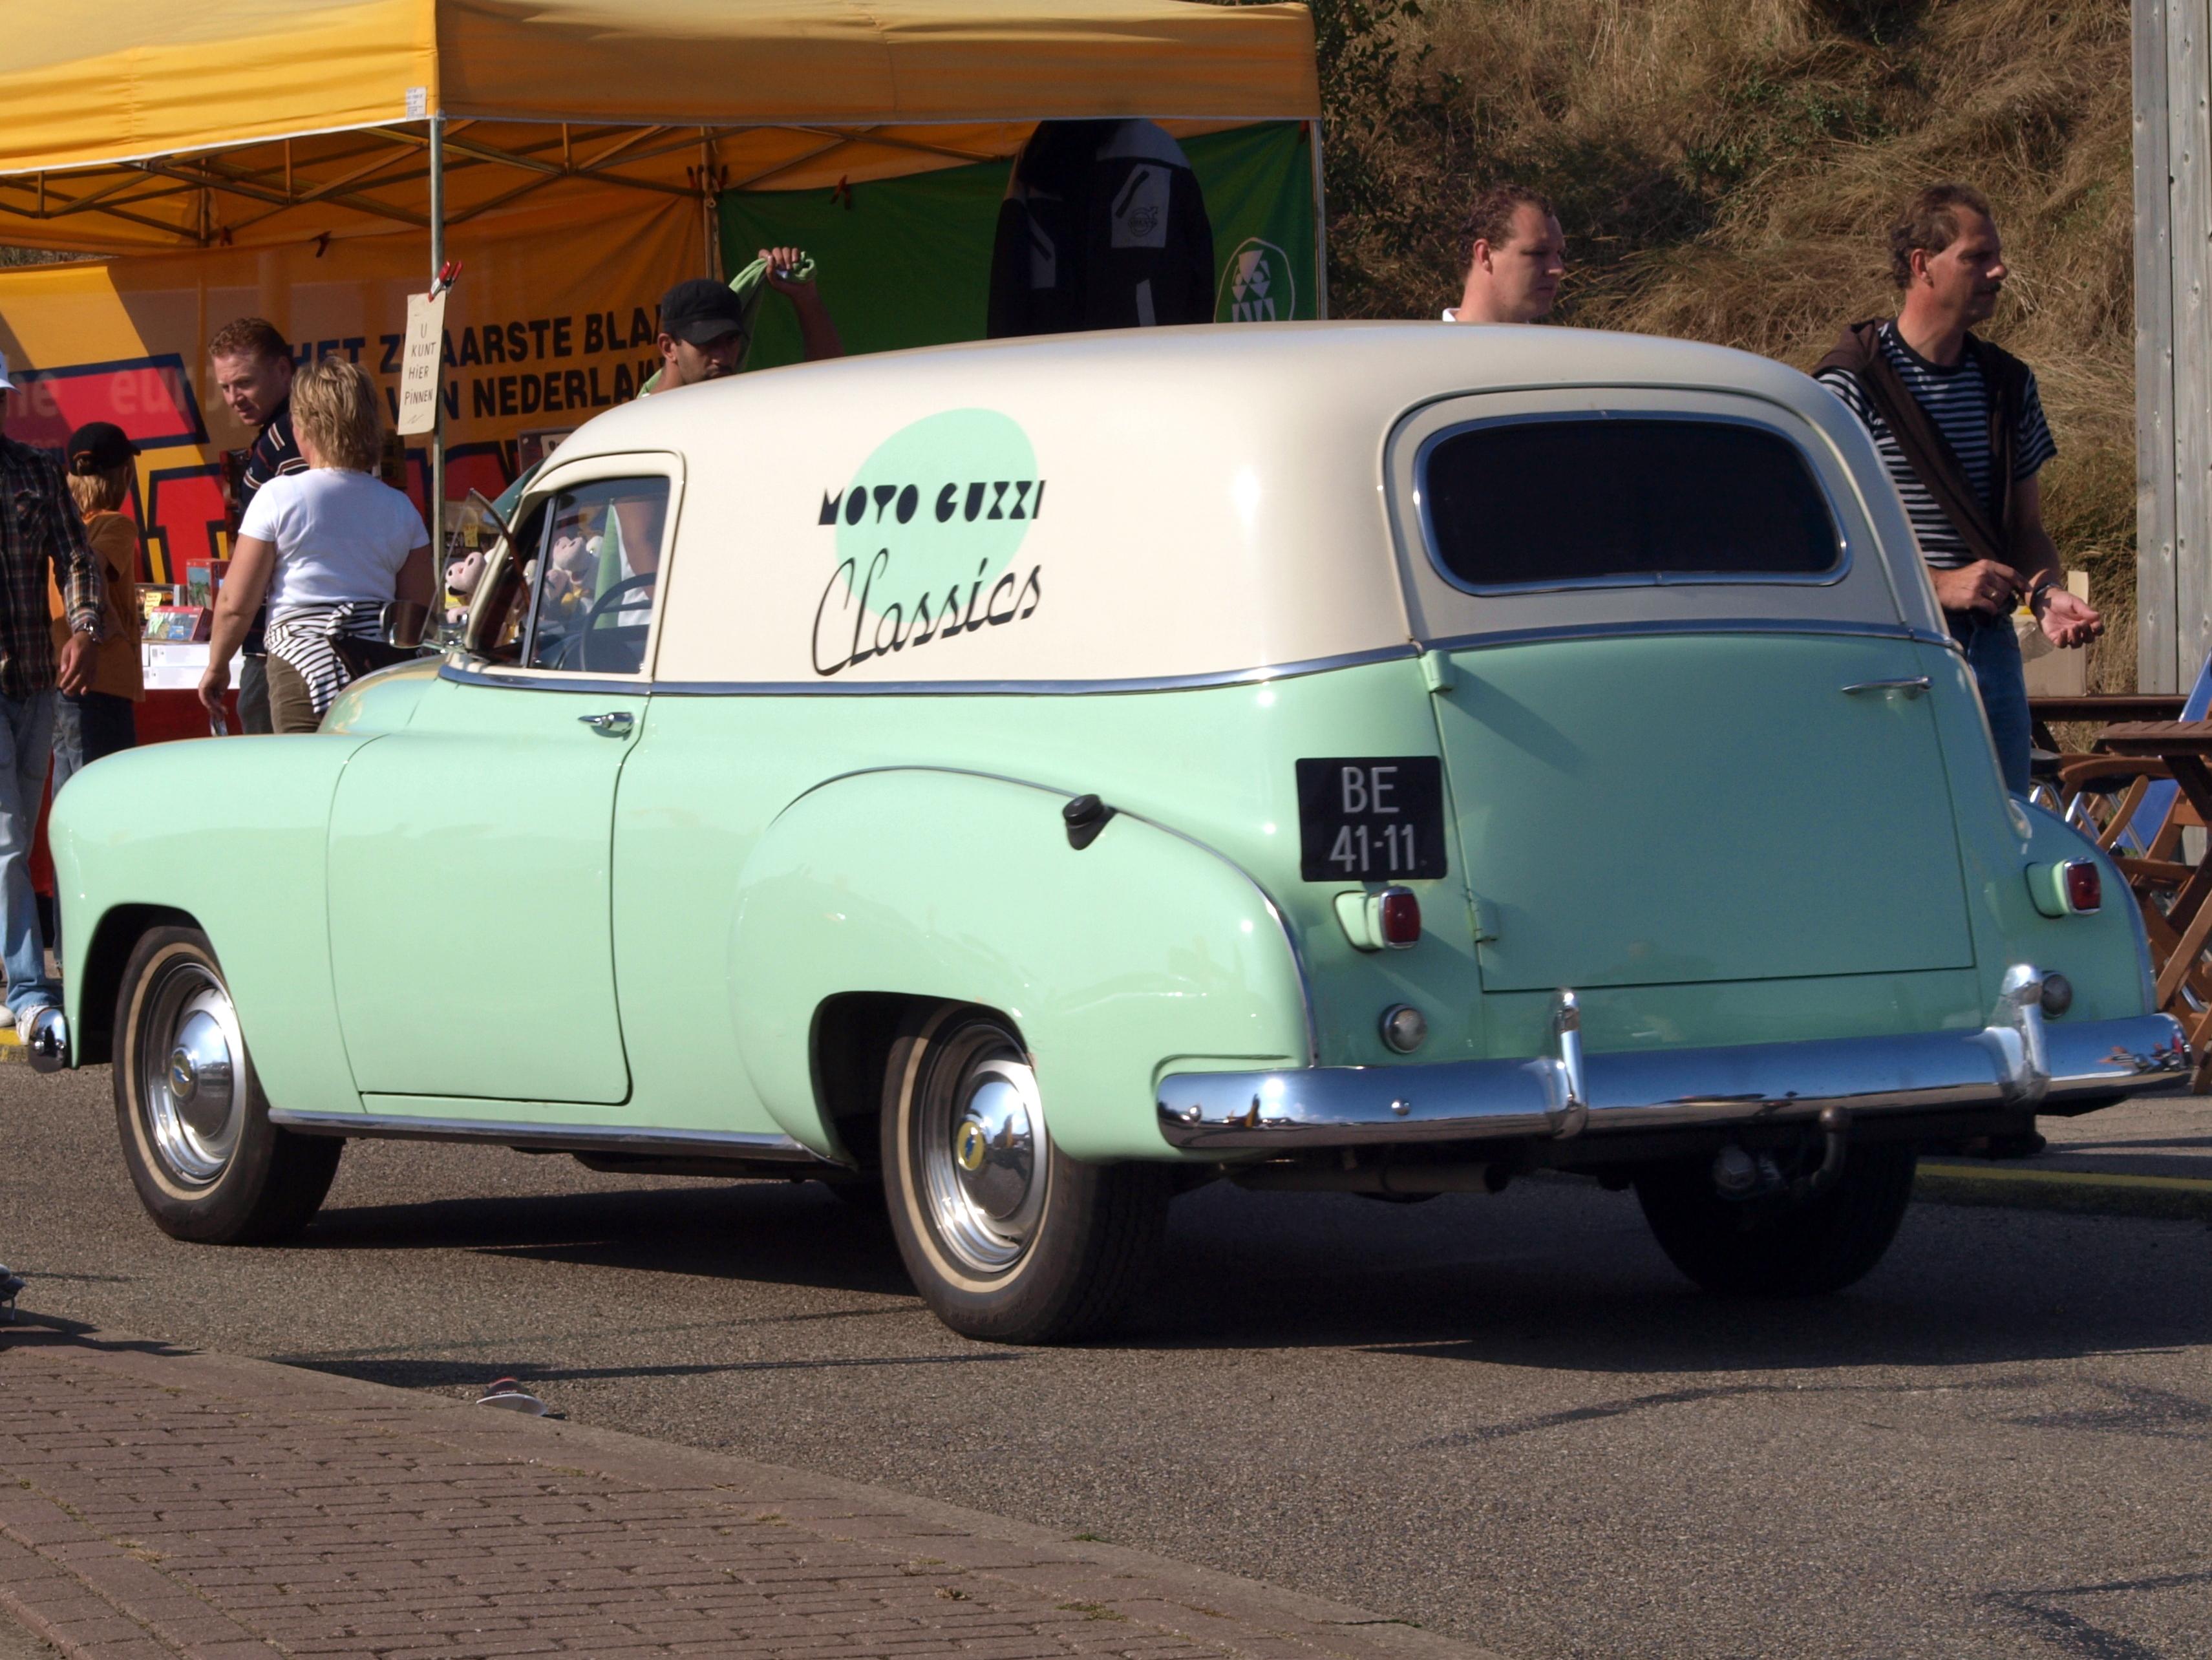 File Chevrolet Sedan Delivery Dutch Licence Registration Be 41 11 Pic1 Jpg Wikipedia